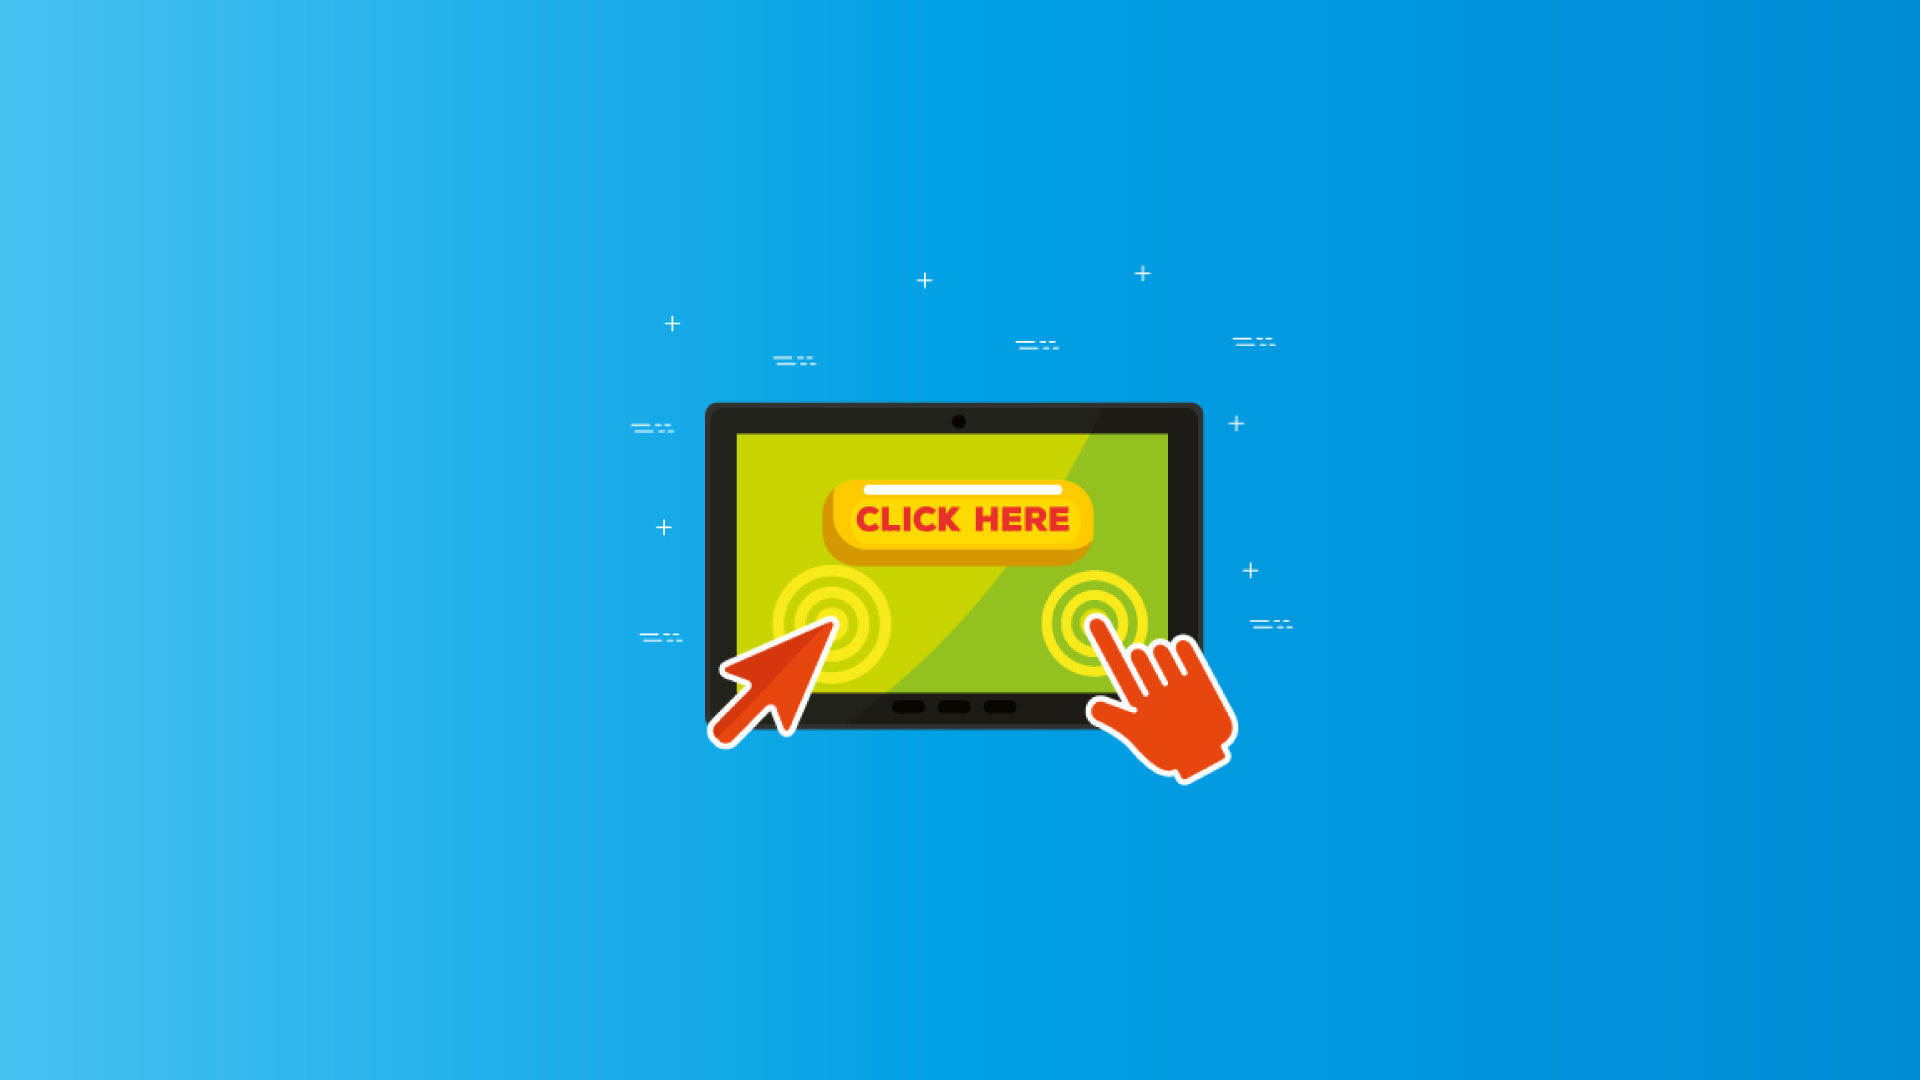 How to avoid invalid click activity?